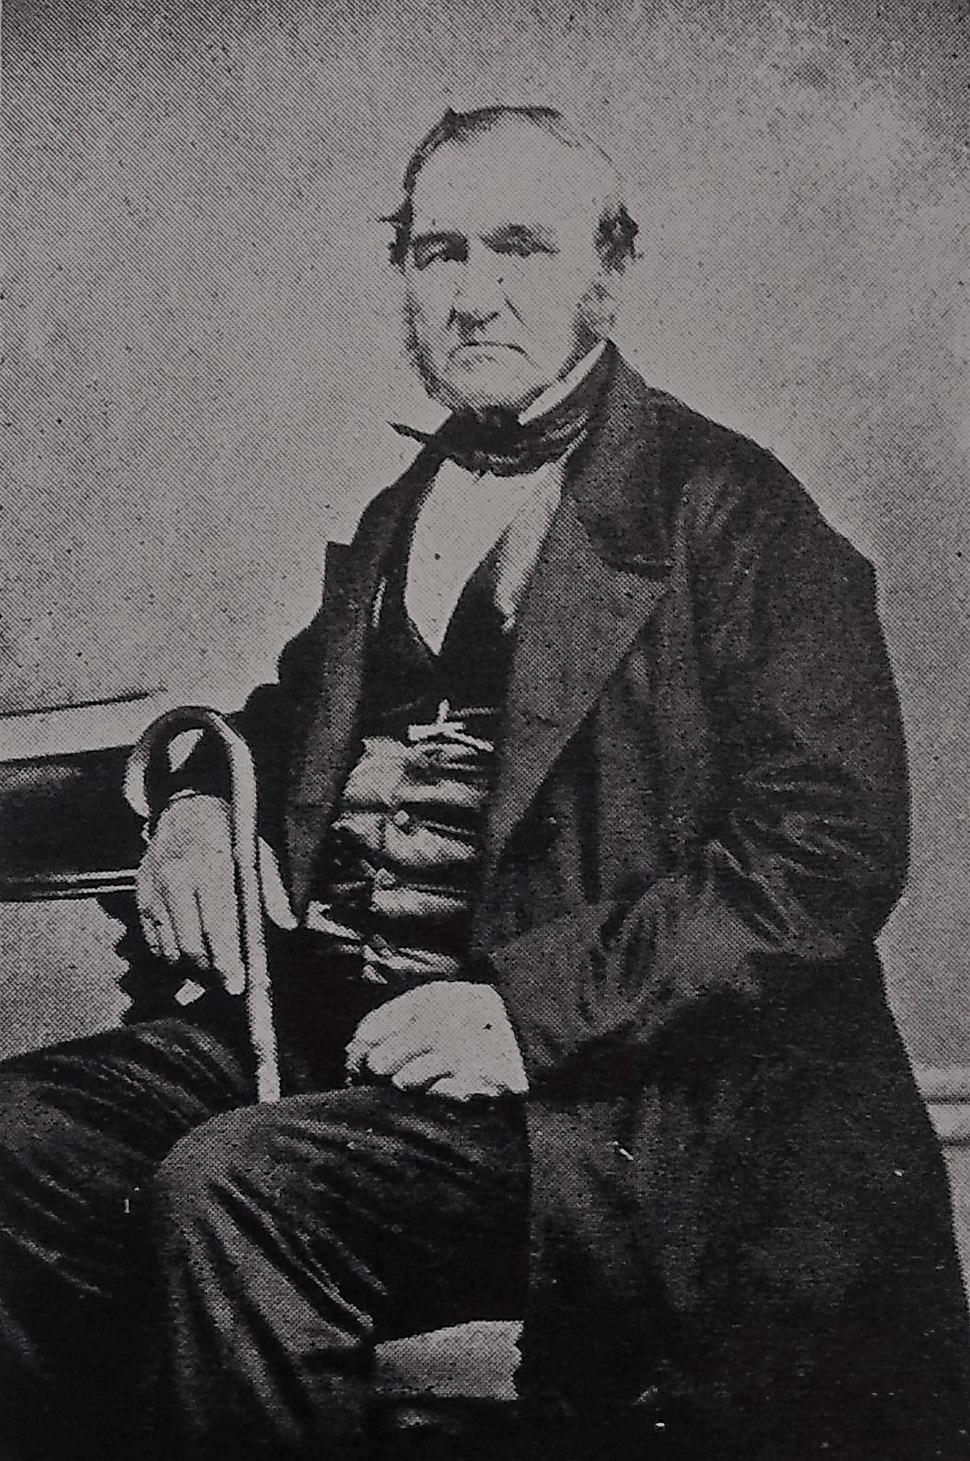 Col. Perley